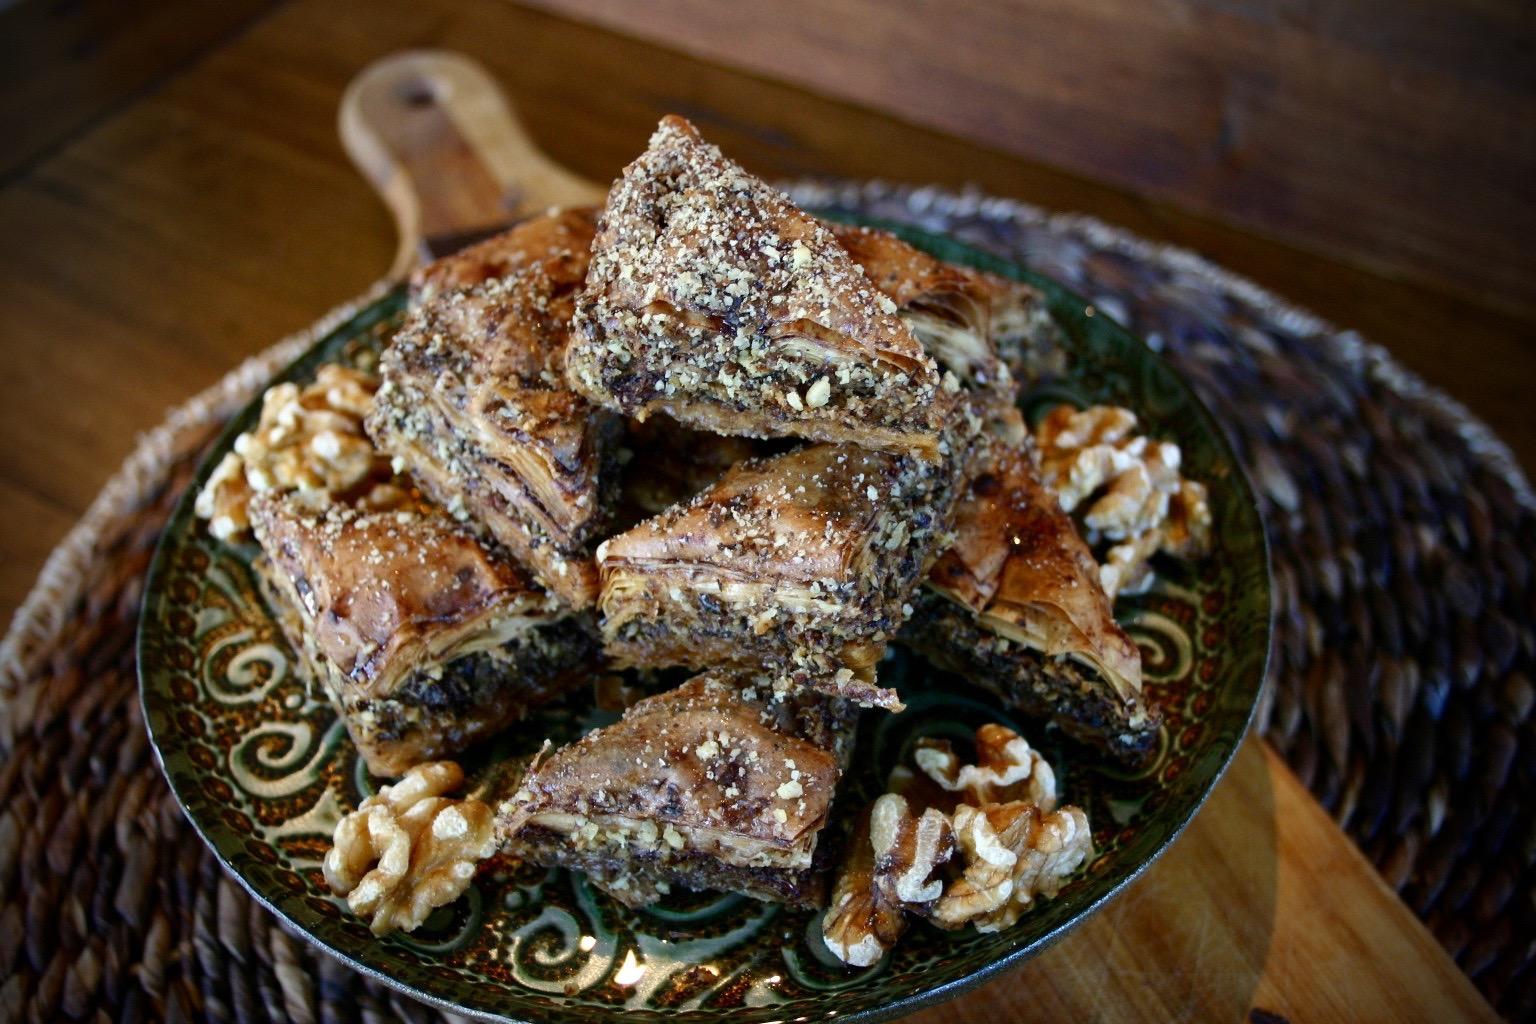 Chocolate Walnut Baklava